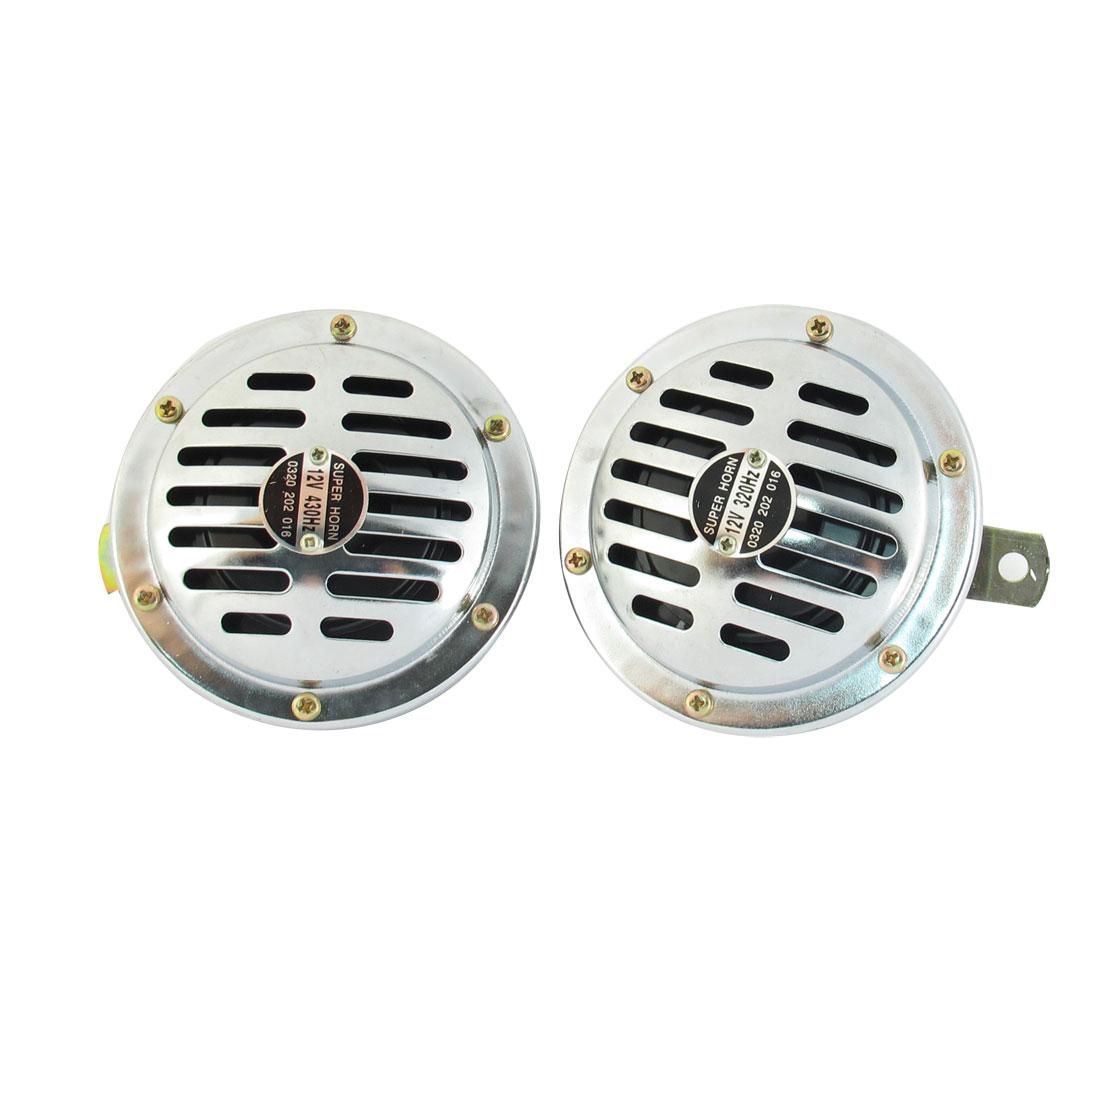 2 Pcs Vehicel Car Silver Tone Metal Shell Warn Horn Trumpet Speaker DC 12V